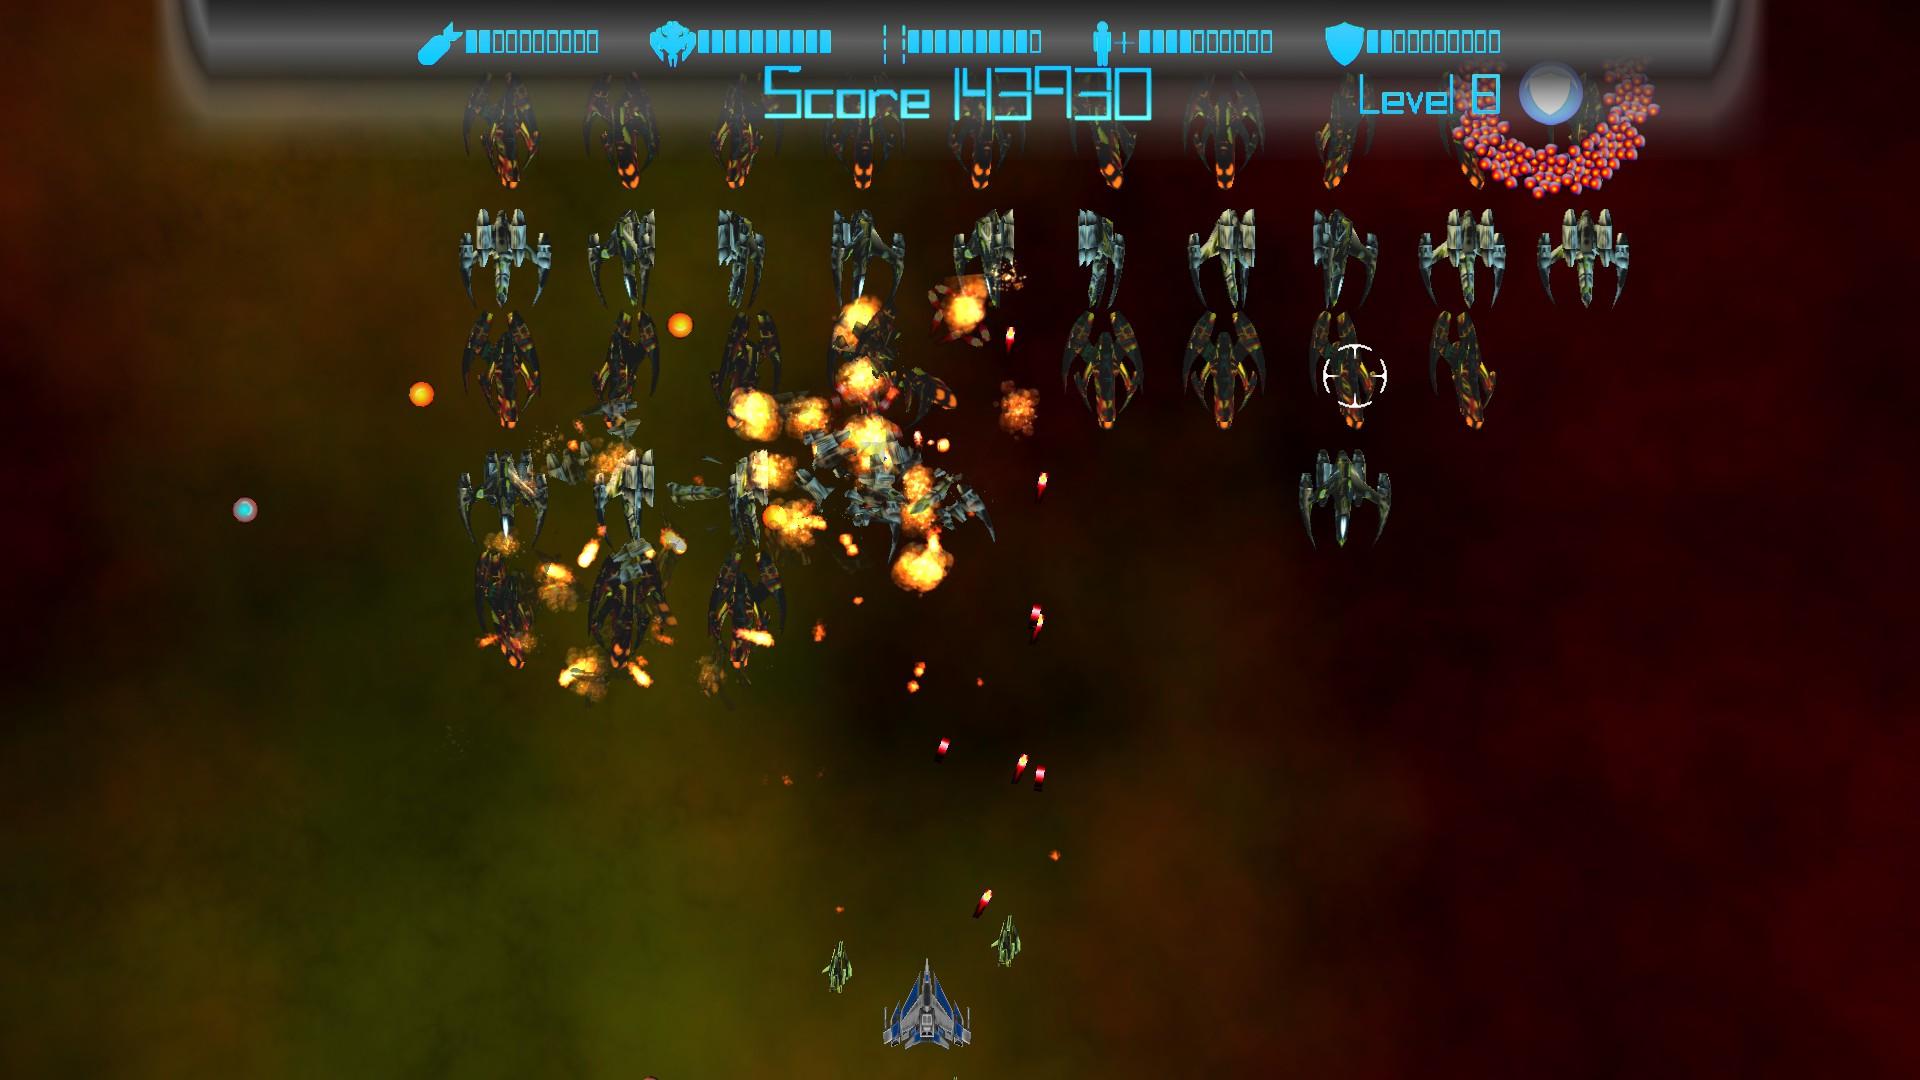 GalaxIverse screenshot